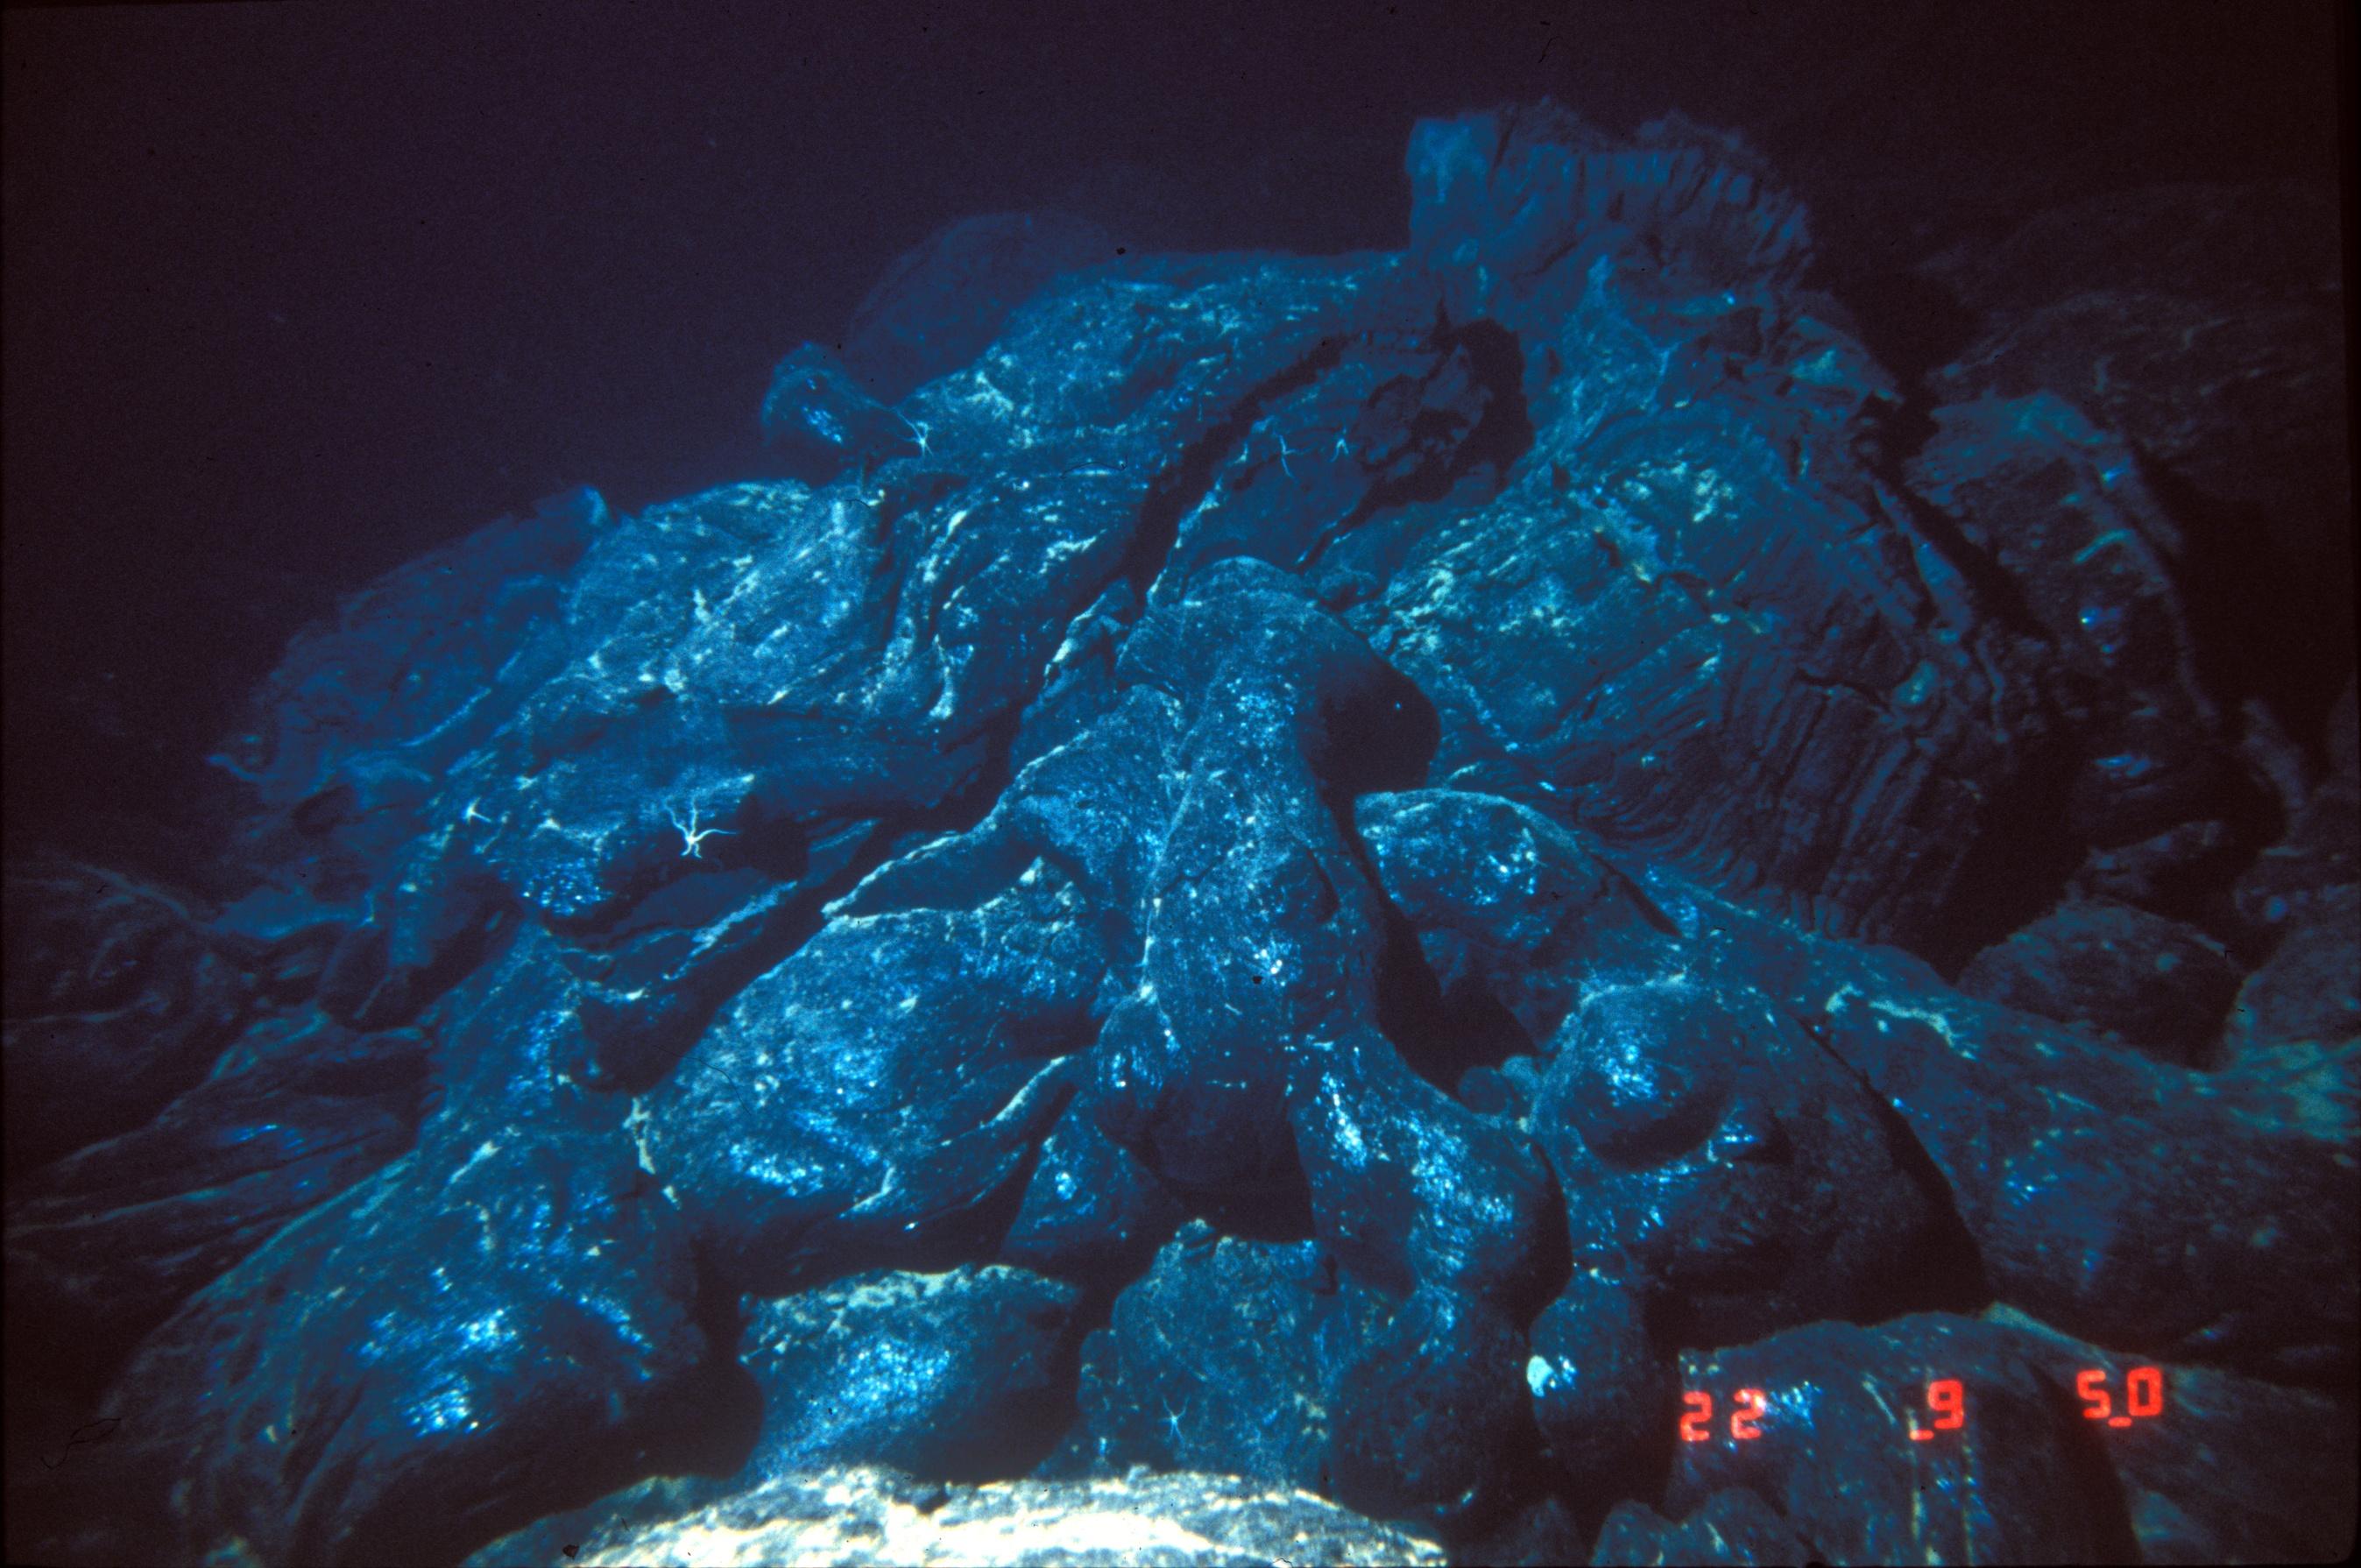 File:Nur05028 - pile of pillow lava.jpg - Wikimedia Commons